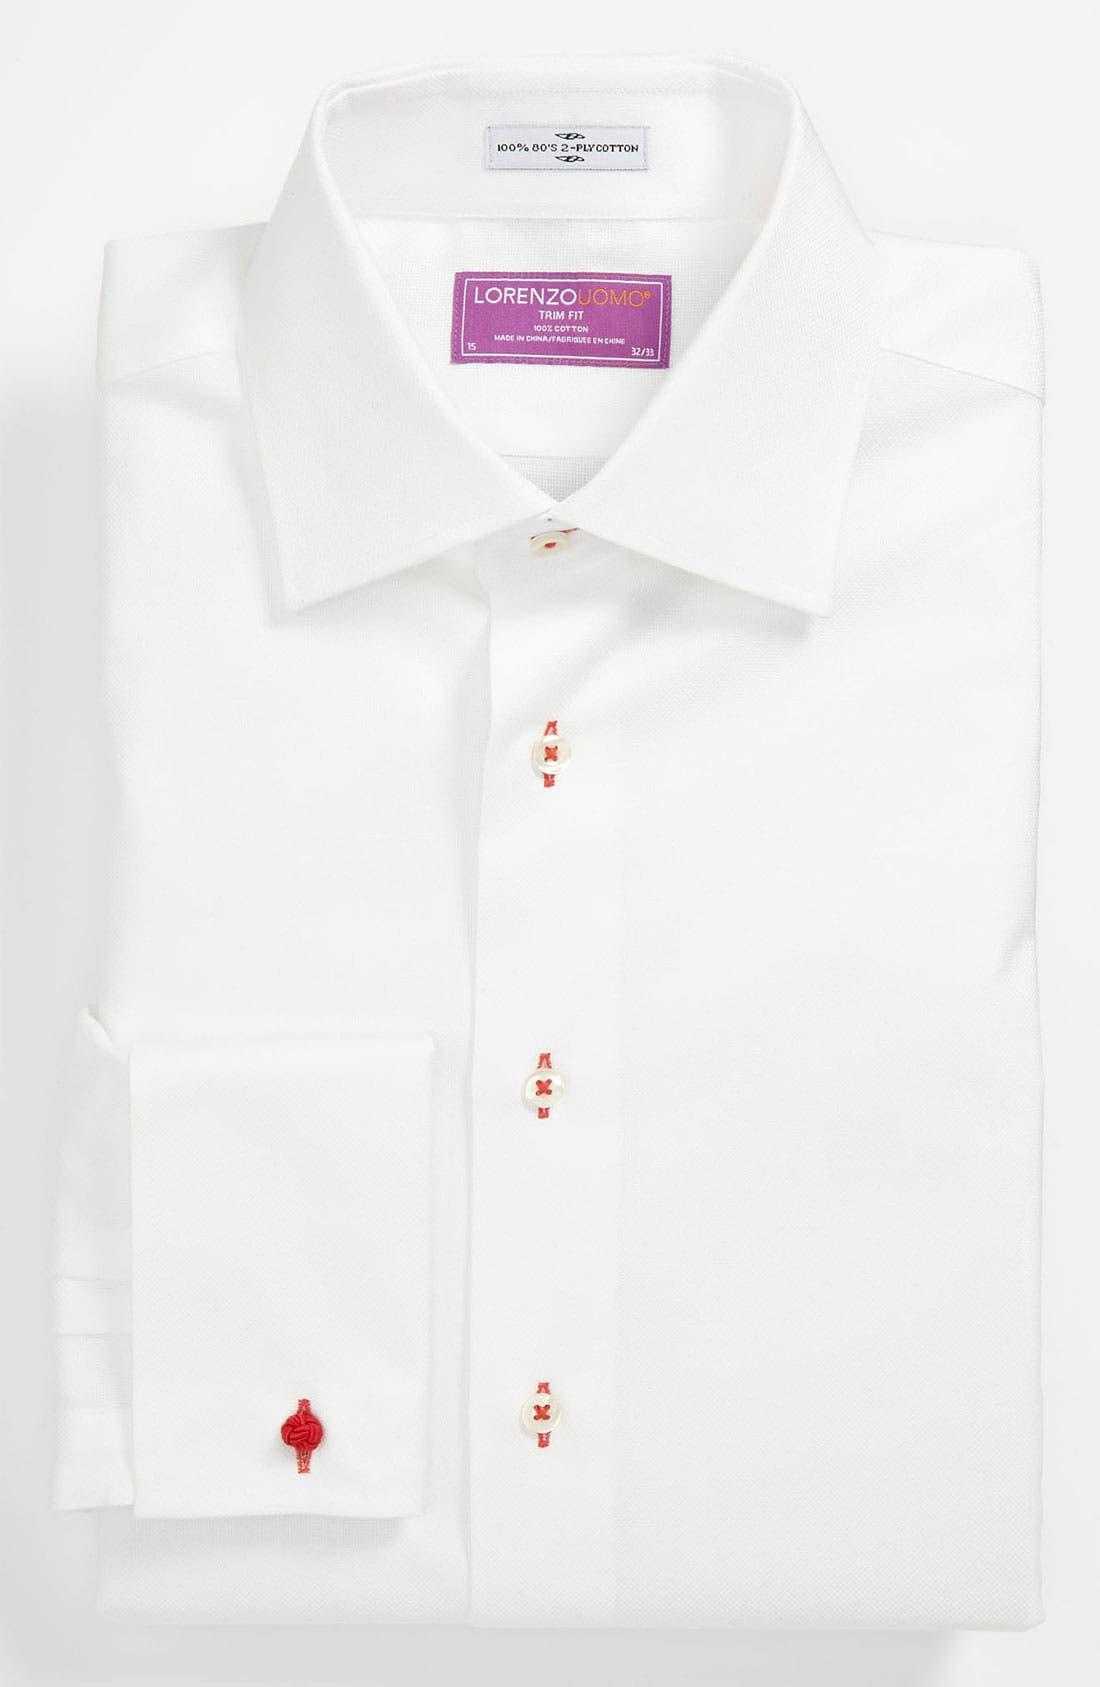 Main Image - Lorenzo Uomo Trim Fit Dress Shirt